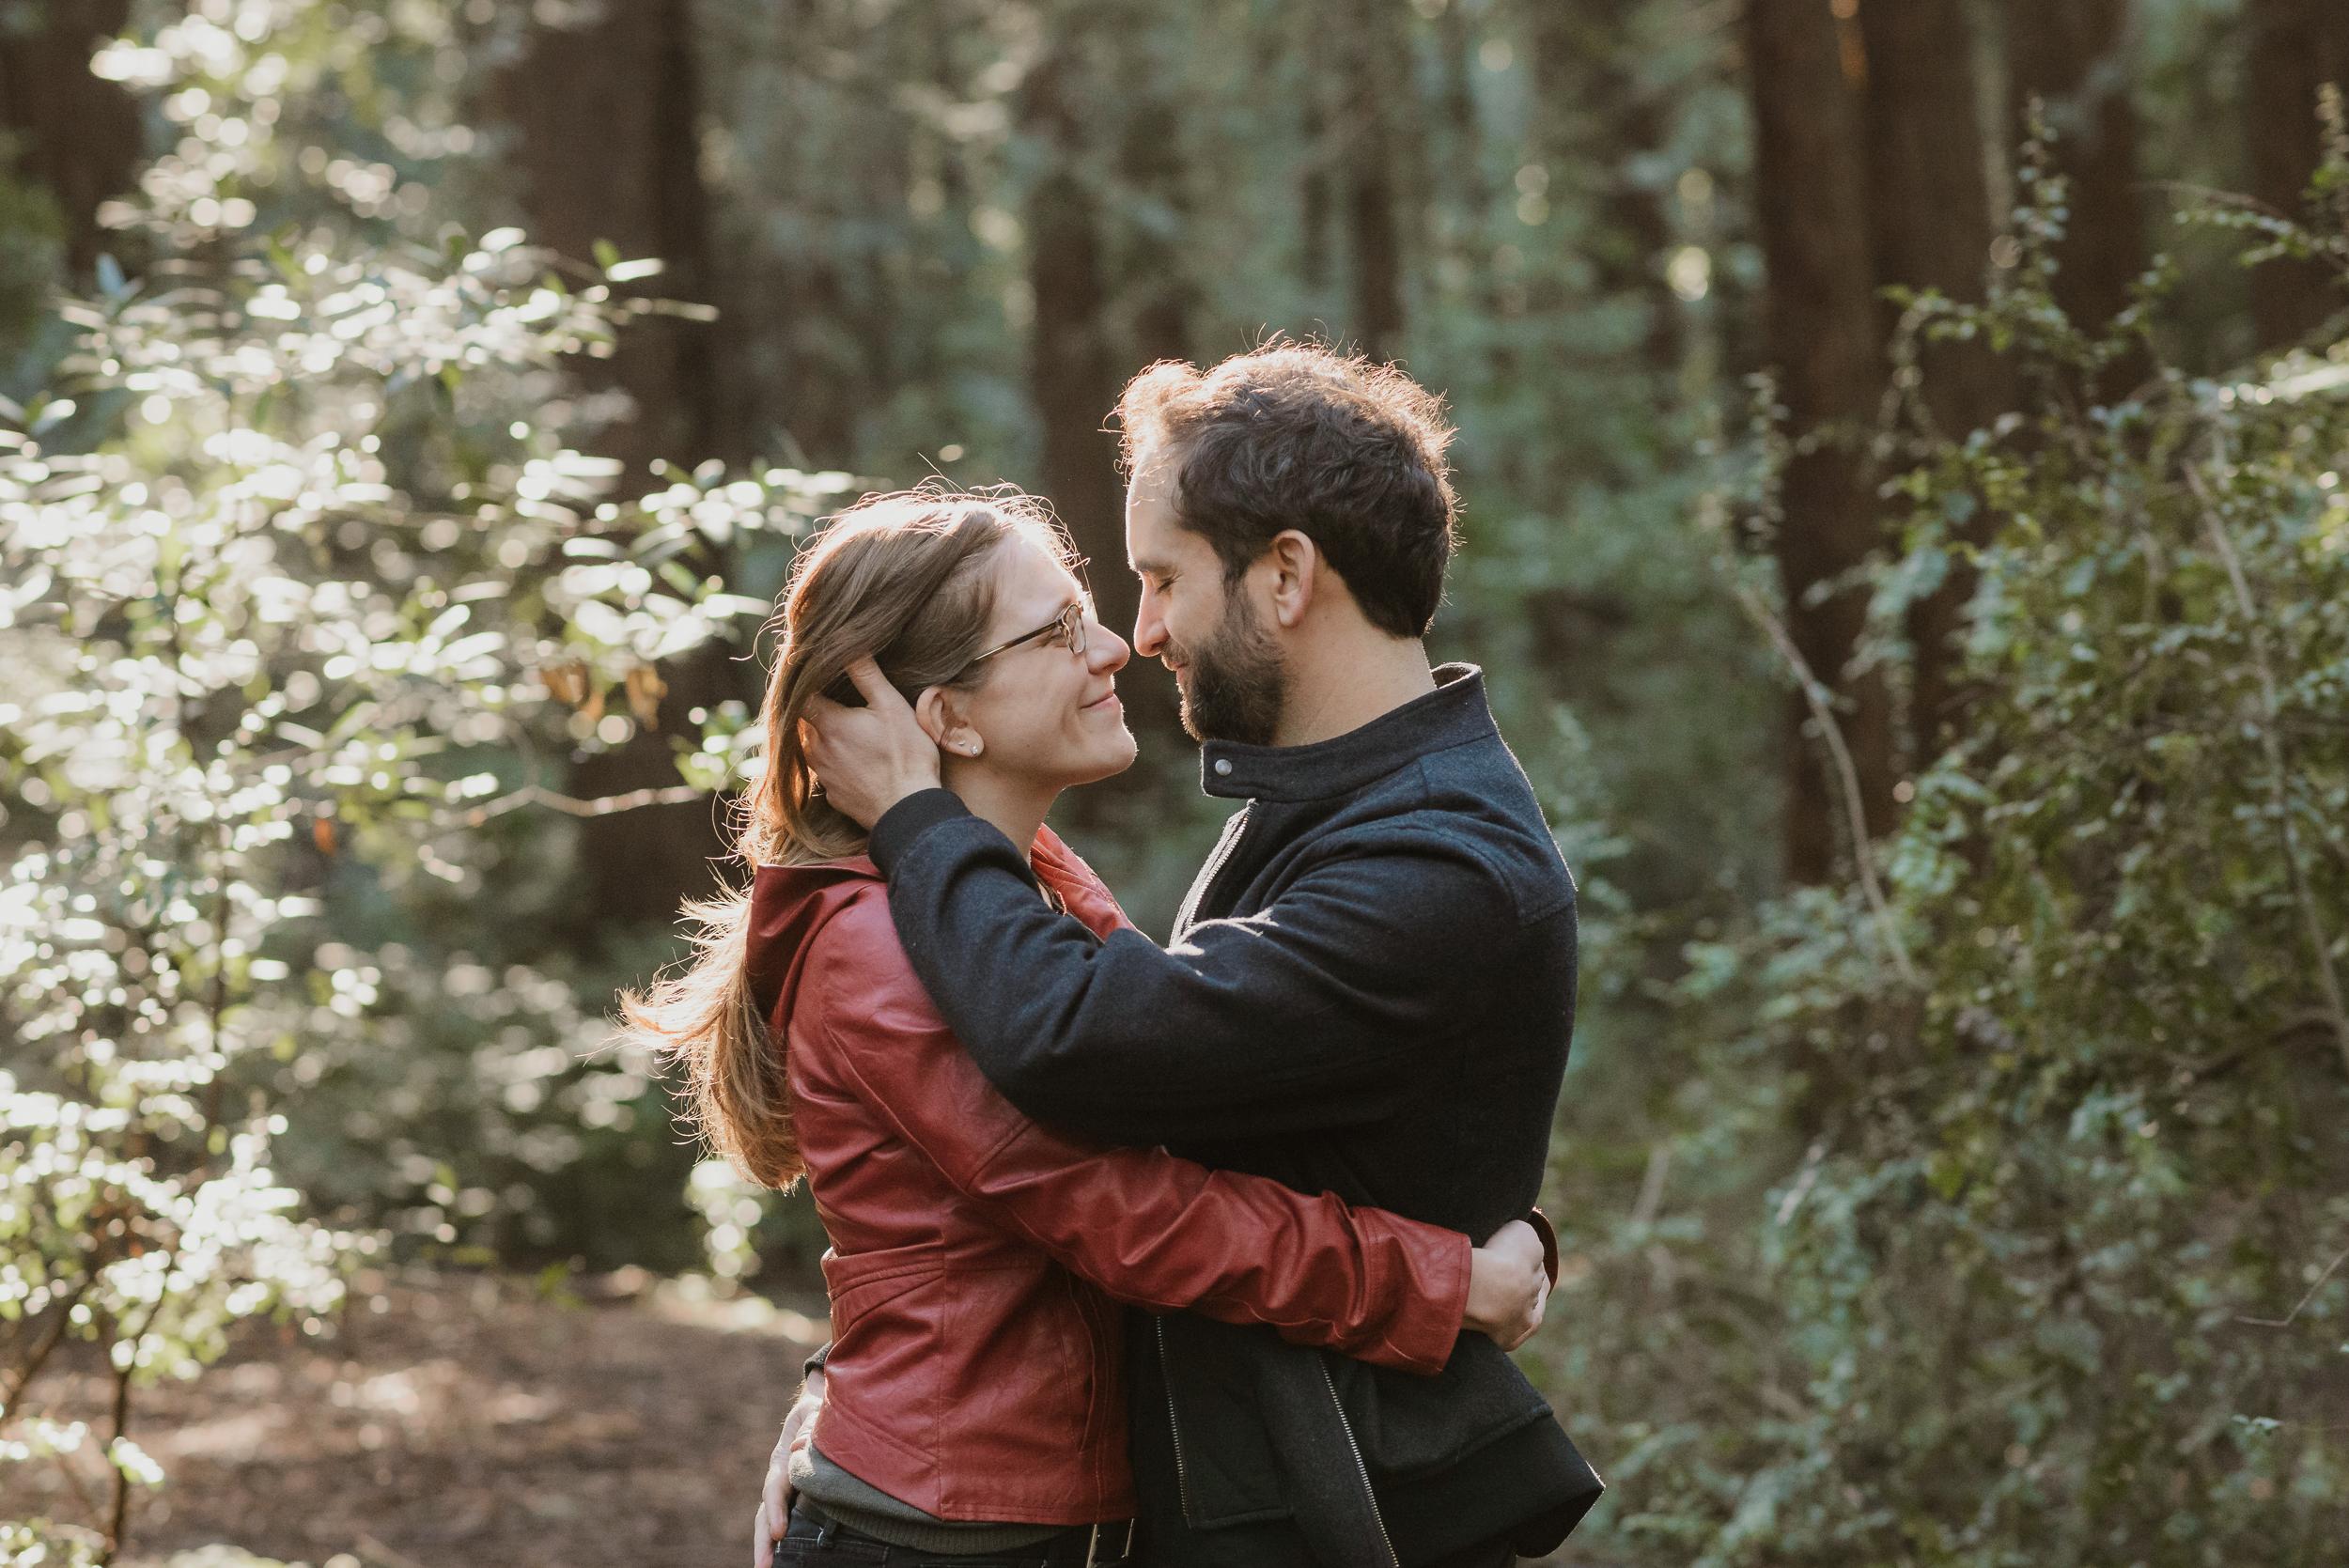 oakland-joaquin-miller-park-redwood-grove-engagement-session-vivianchen-039.jpg